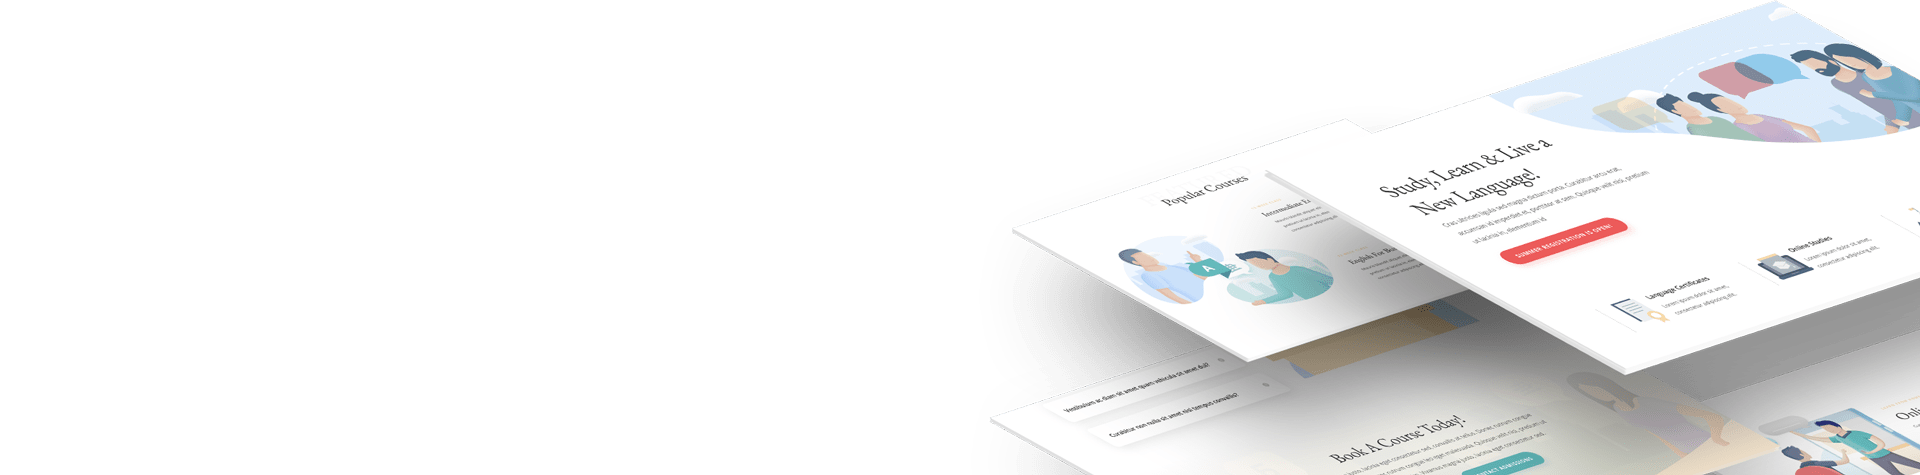 web designer rochester ny